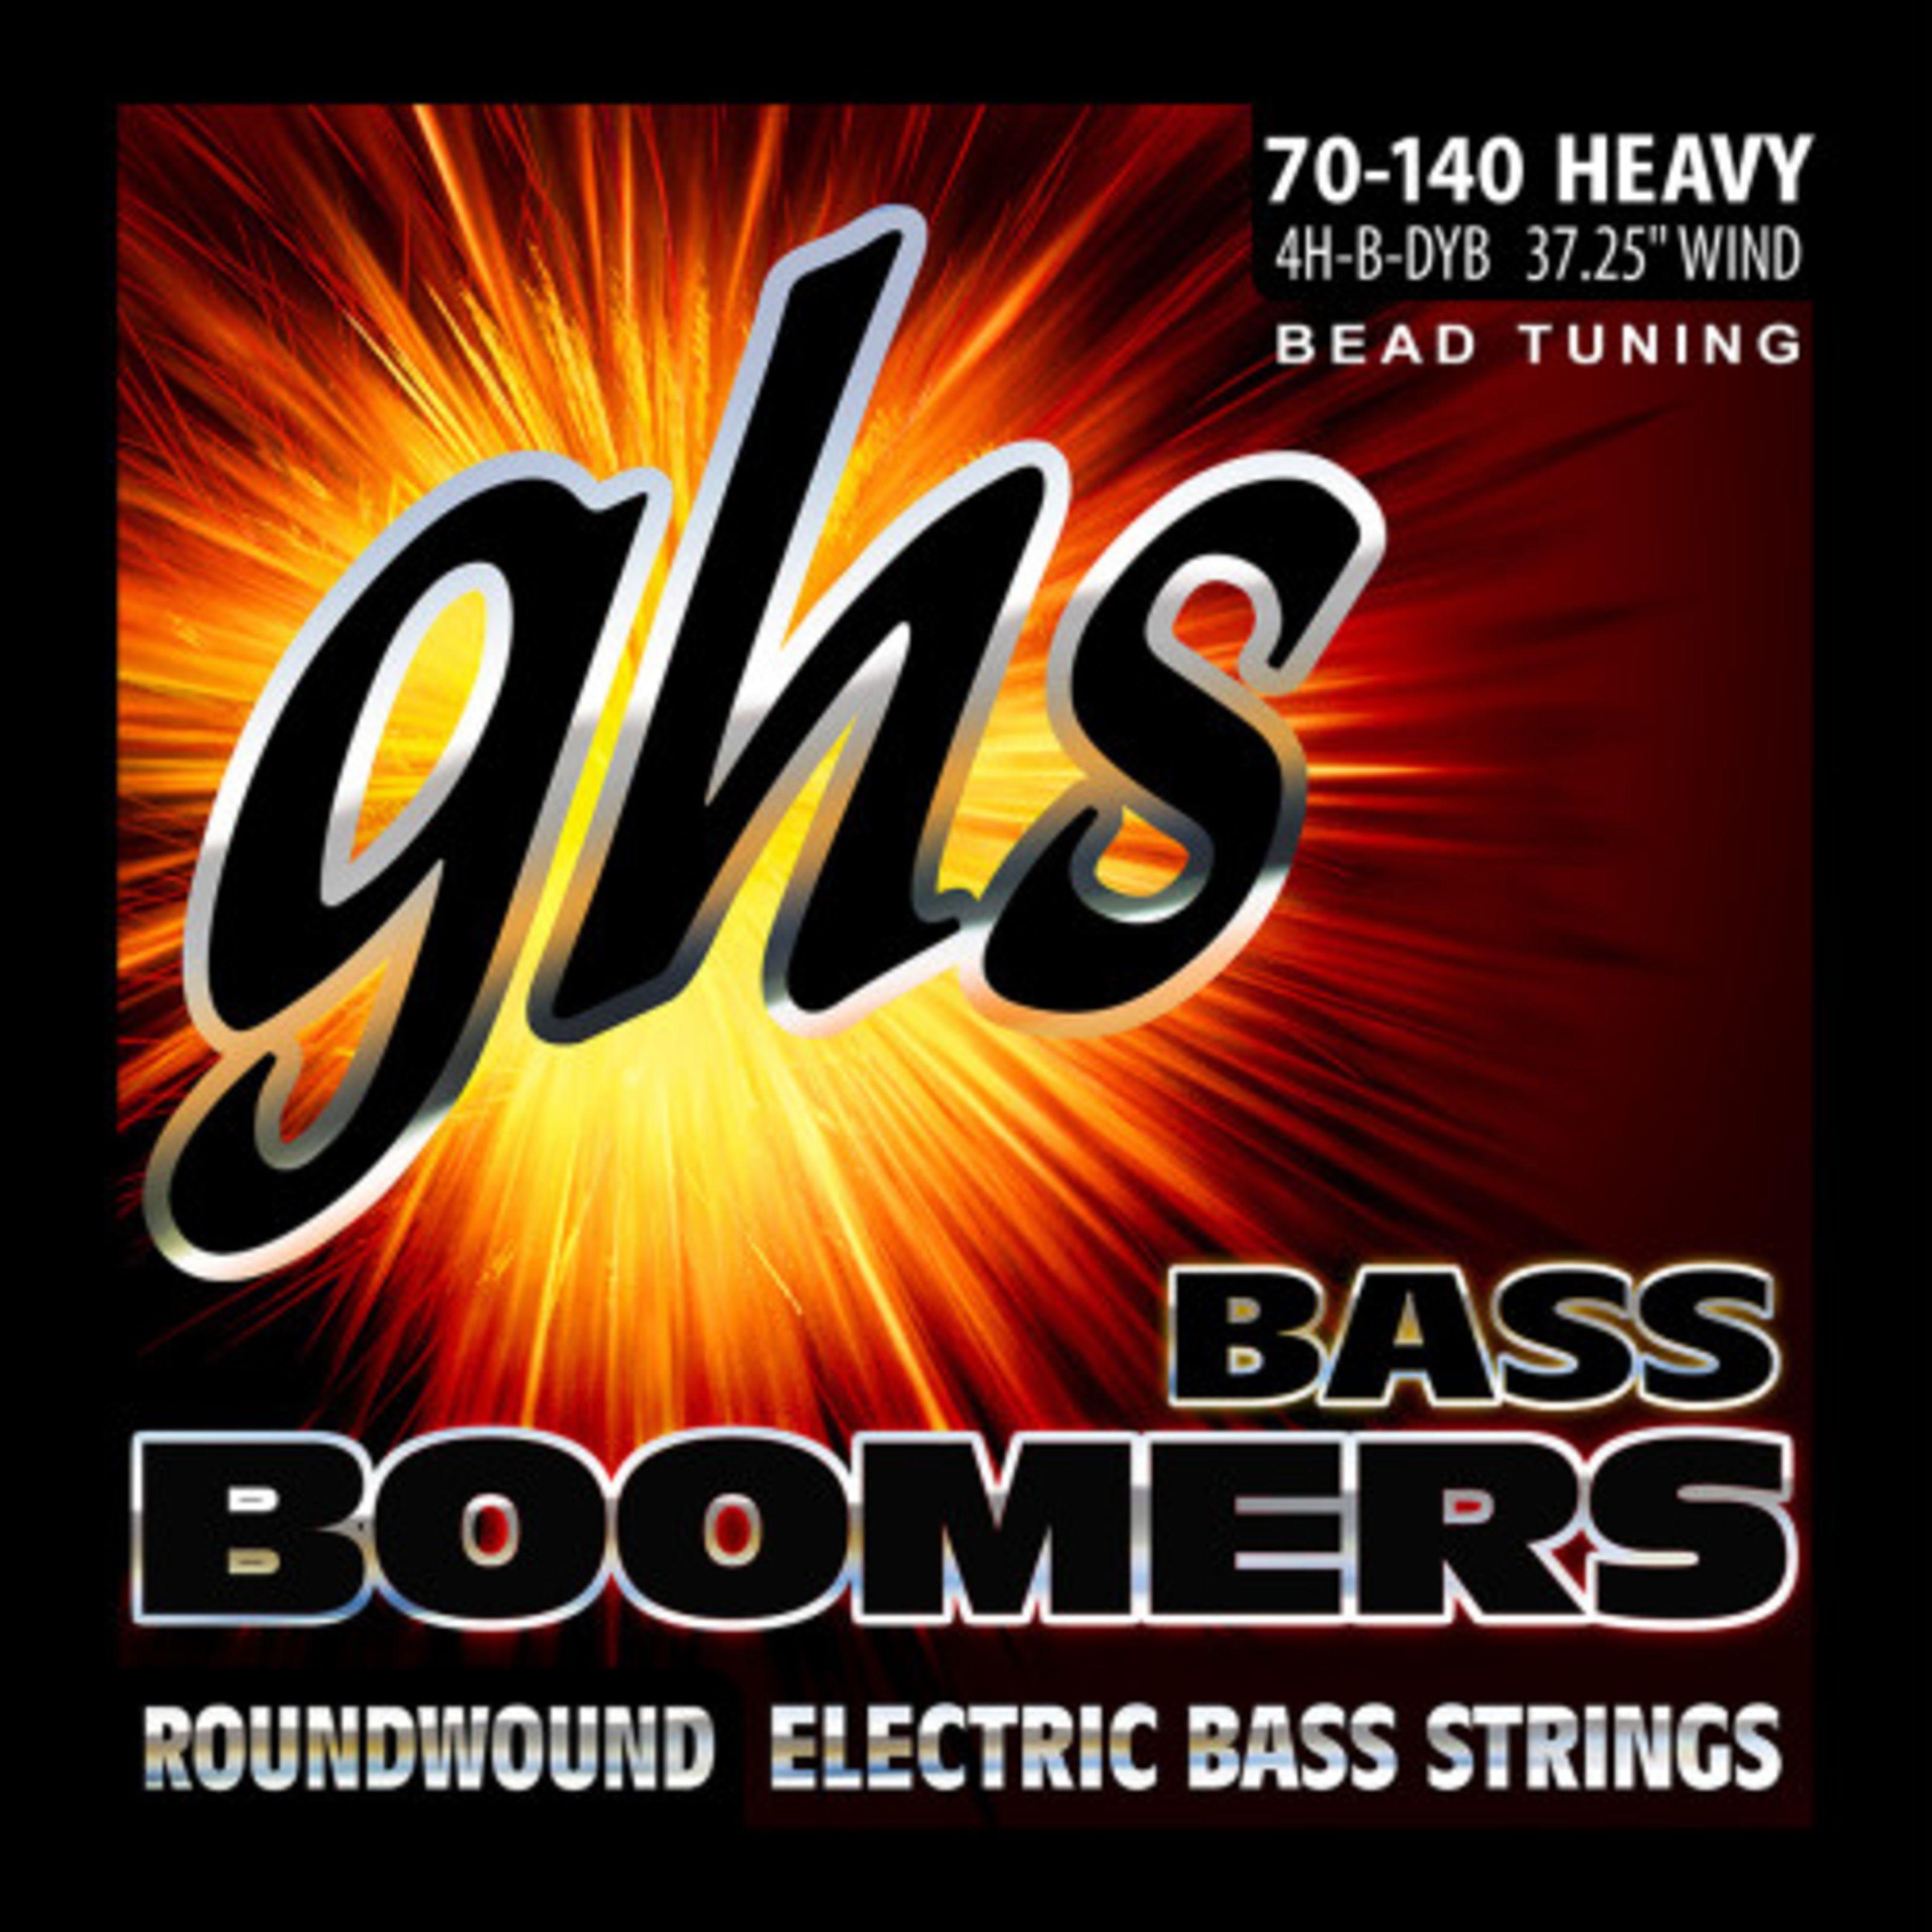 GHS - 4H-B-DYB BEAD Tuned Bass Boomers GHS 3045 4/H B DYB